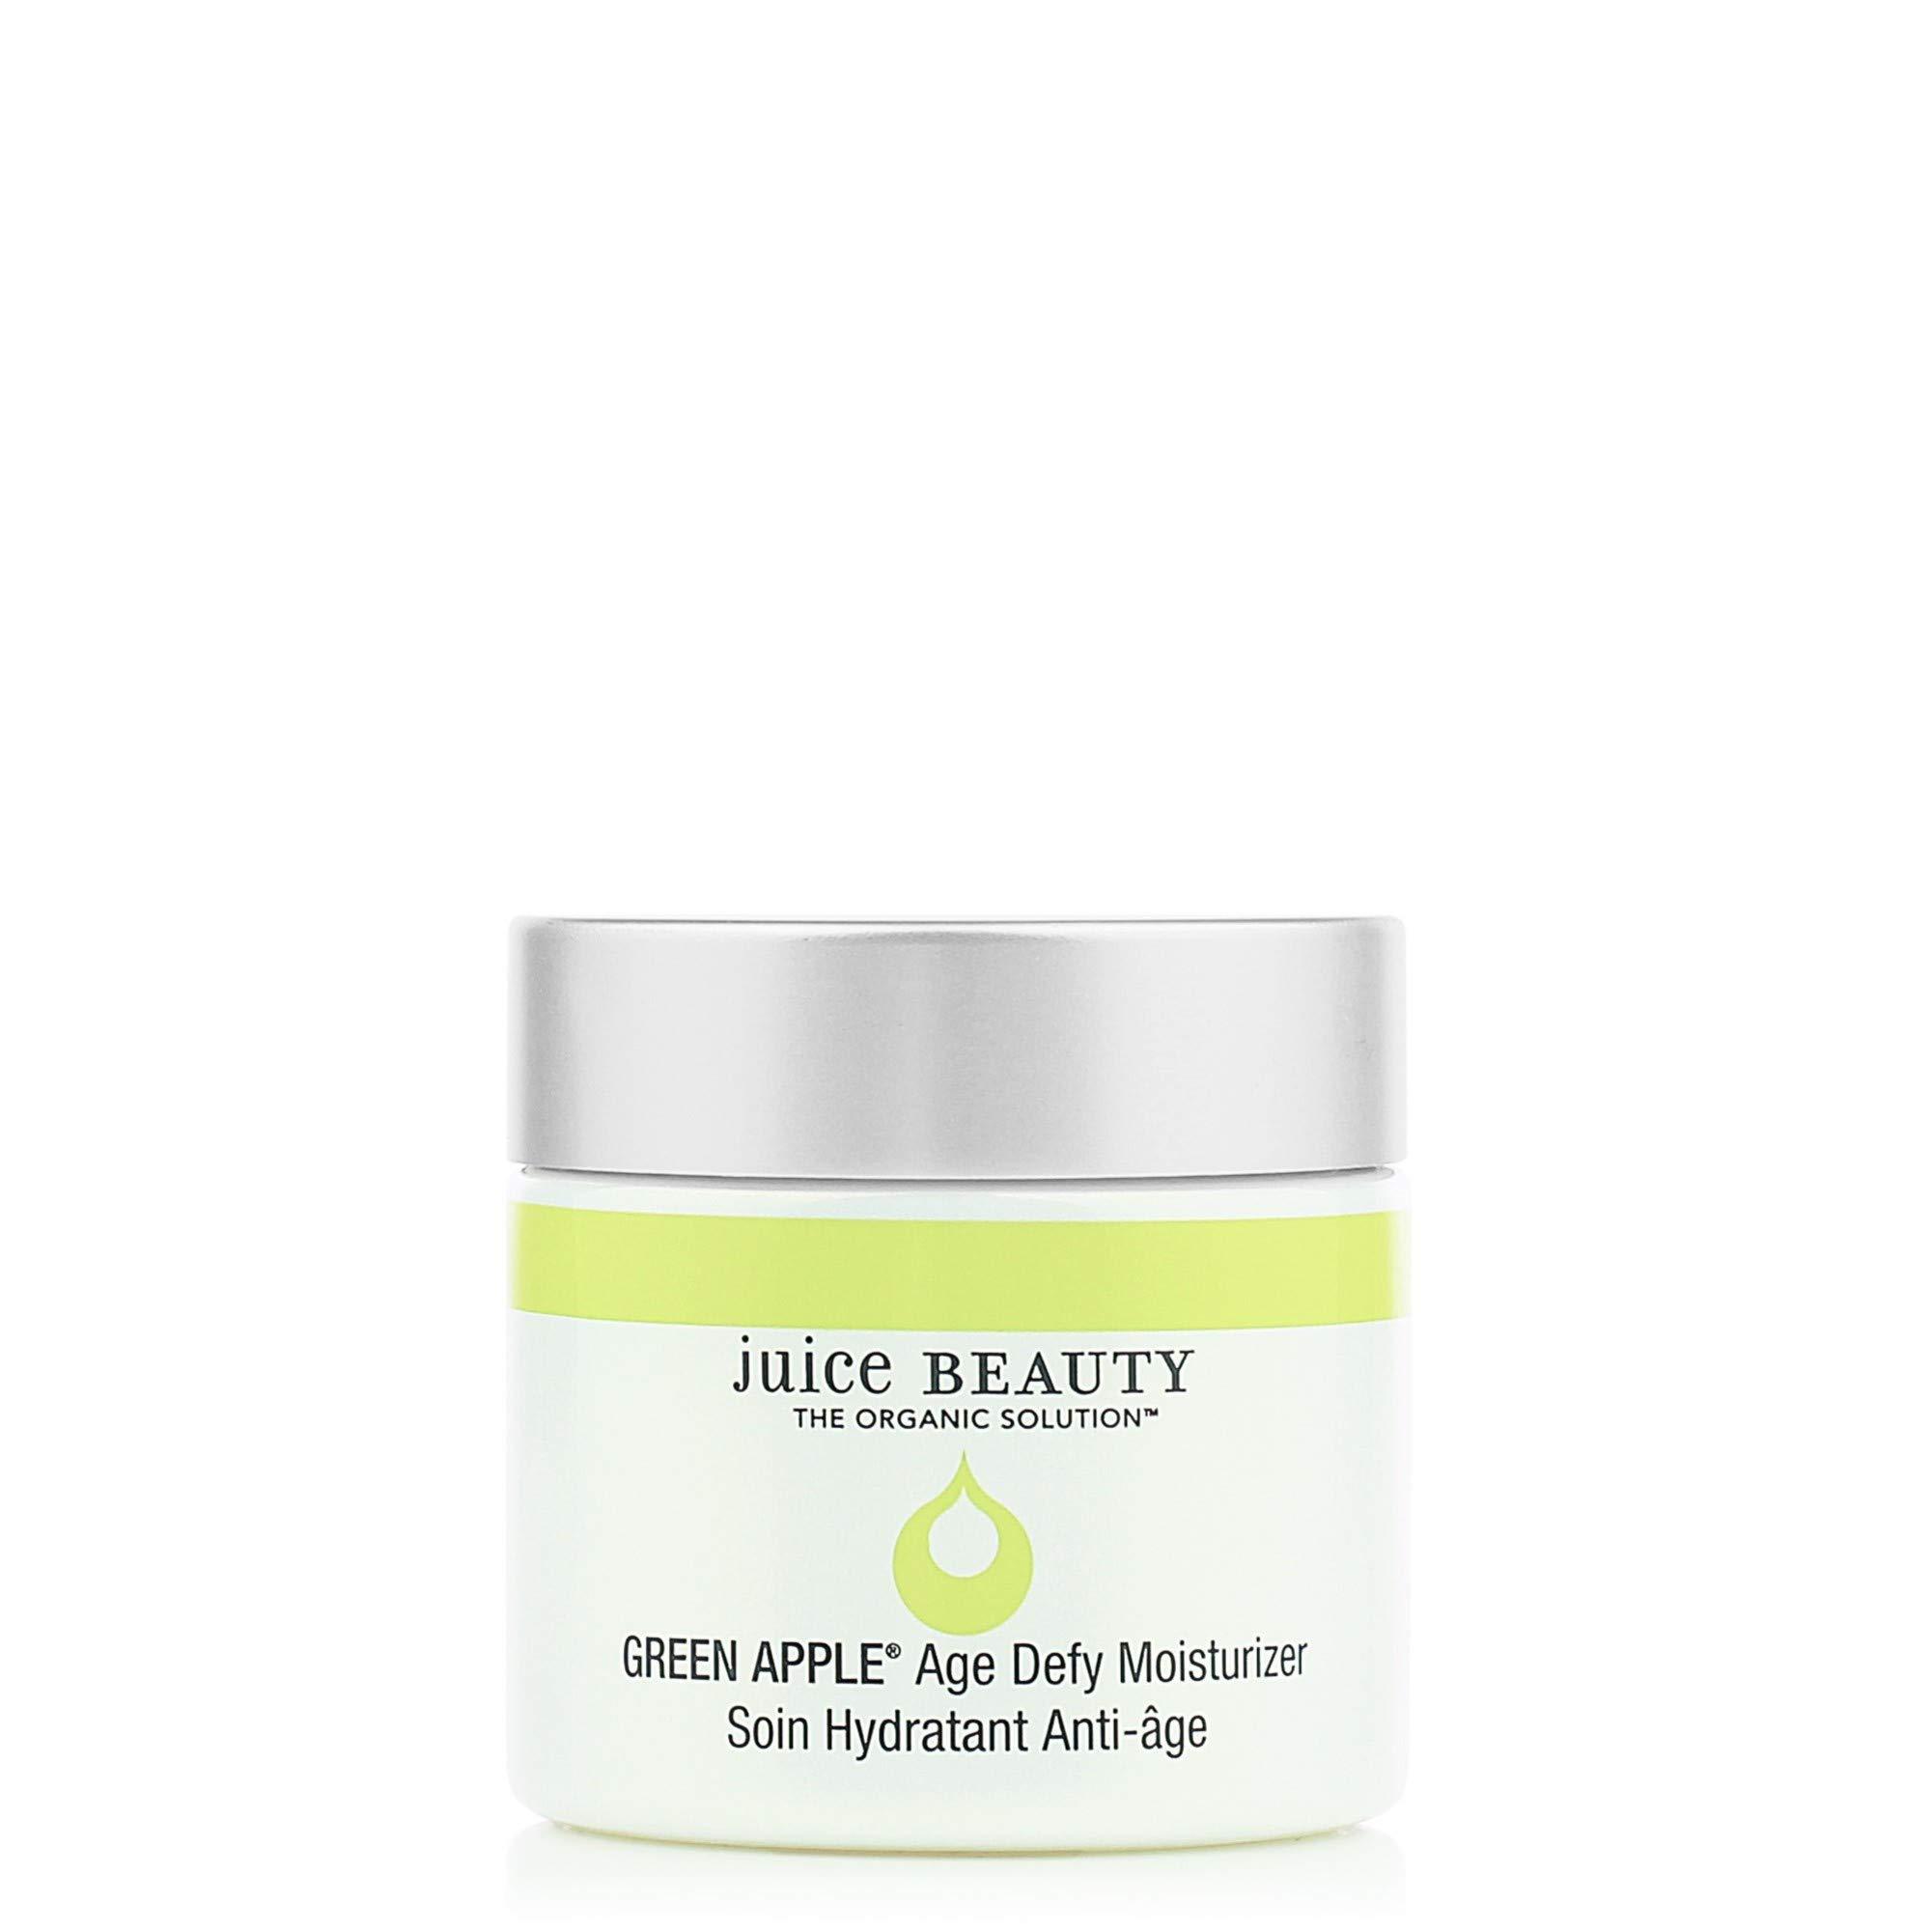 Juice Beauty Green Apple Age Defy, Serum and Moisturizer